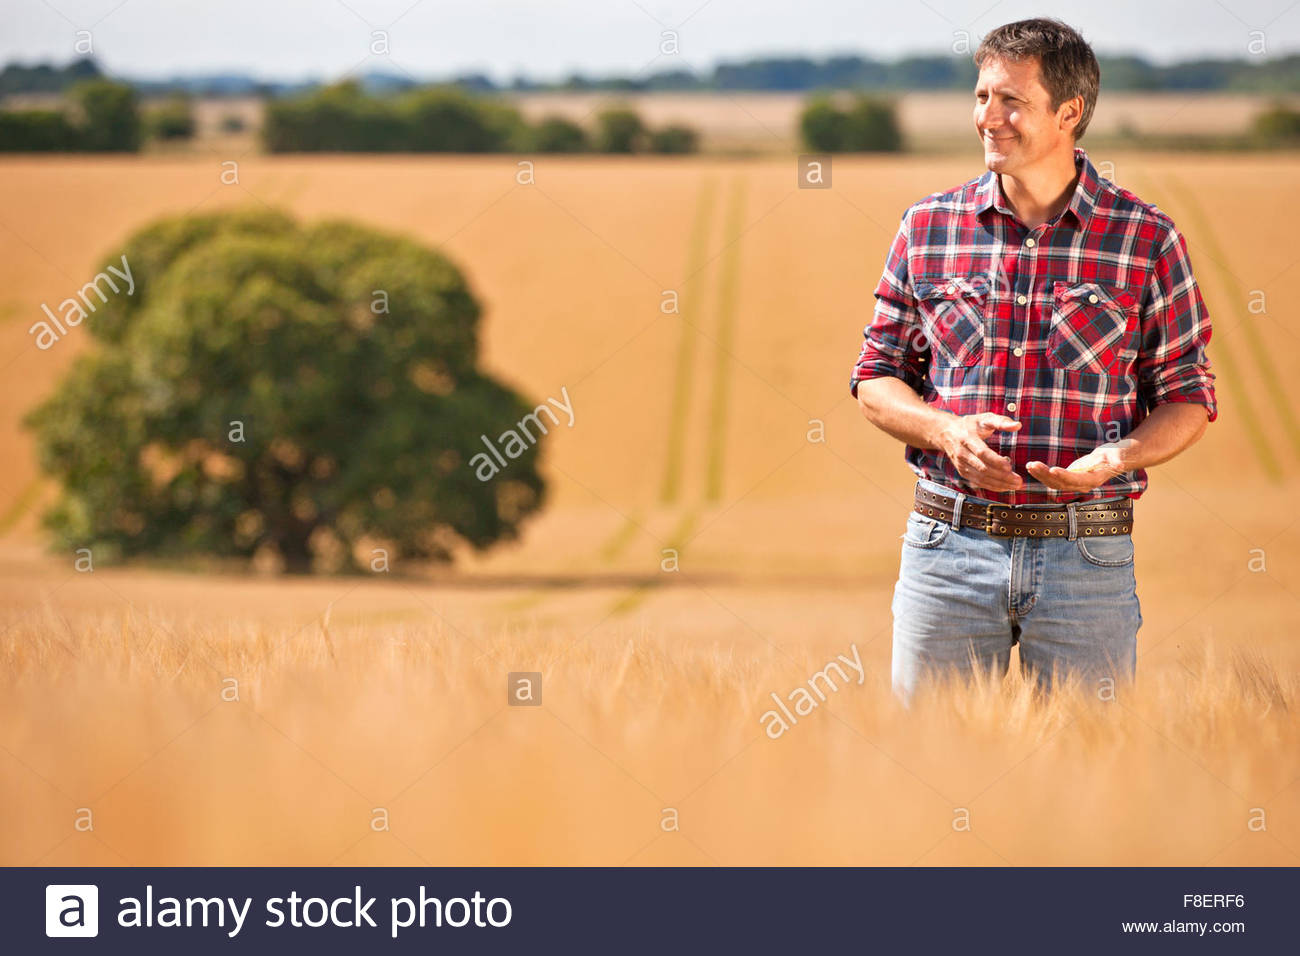 Farmer looking away in sunny rural barley crop field - Stock Image